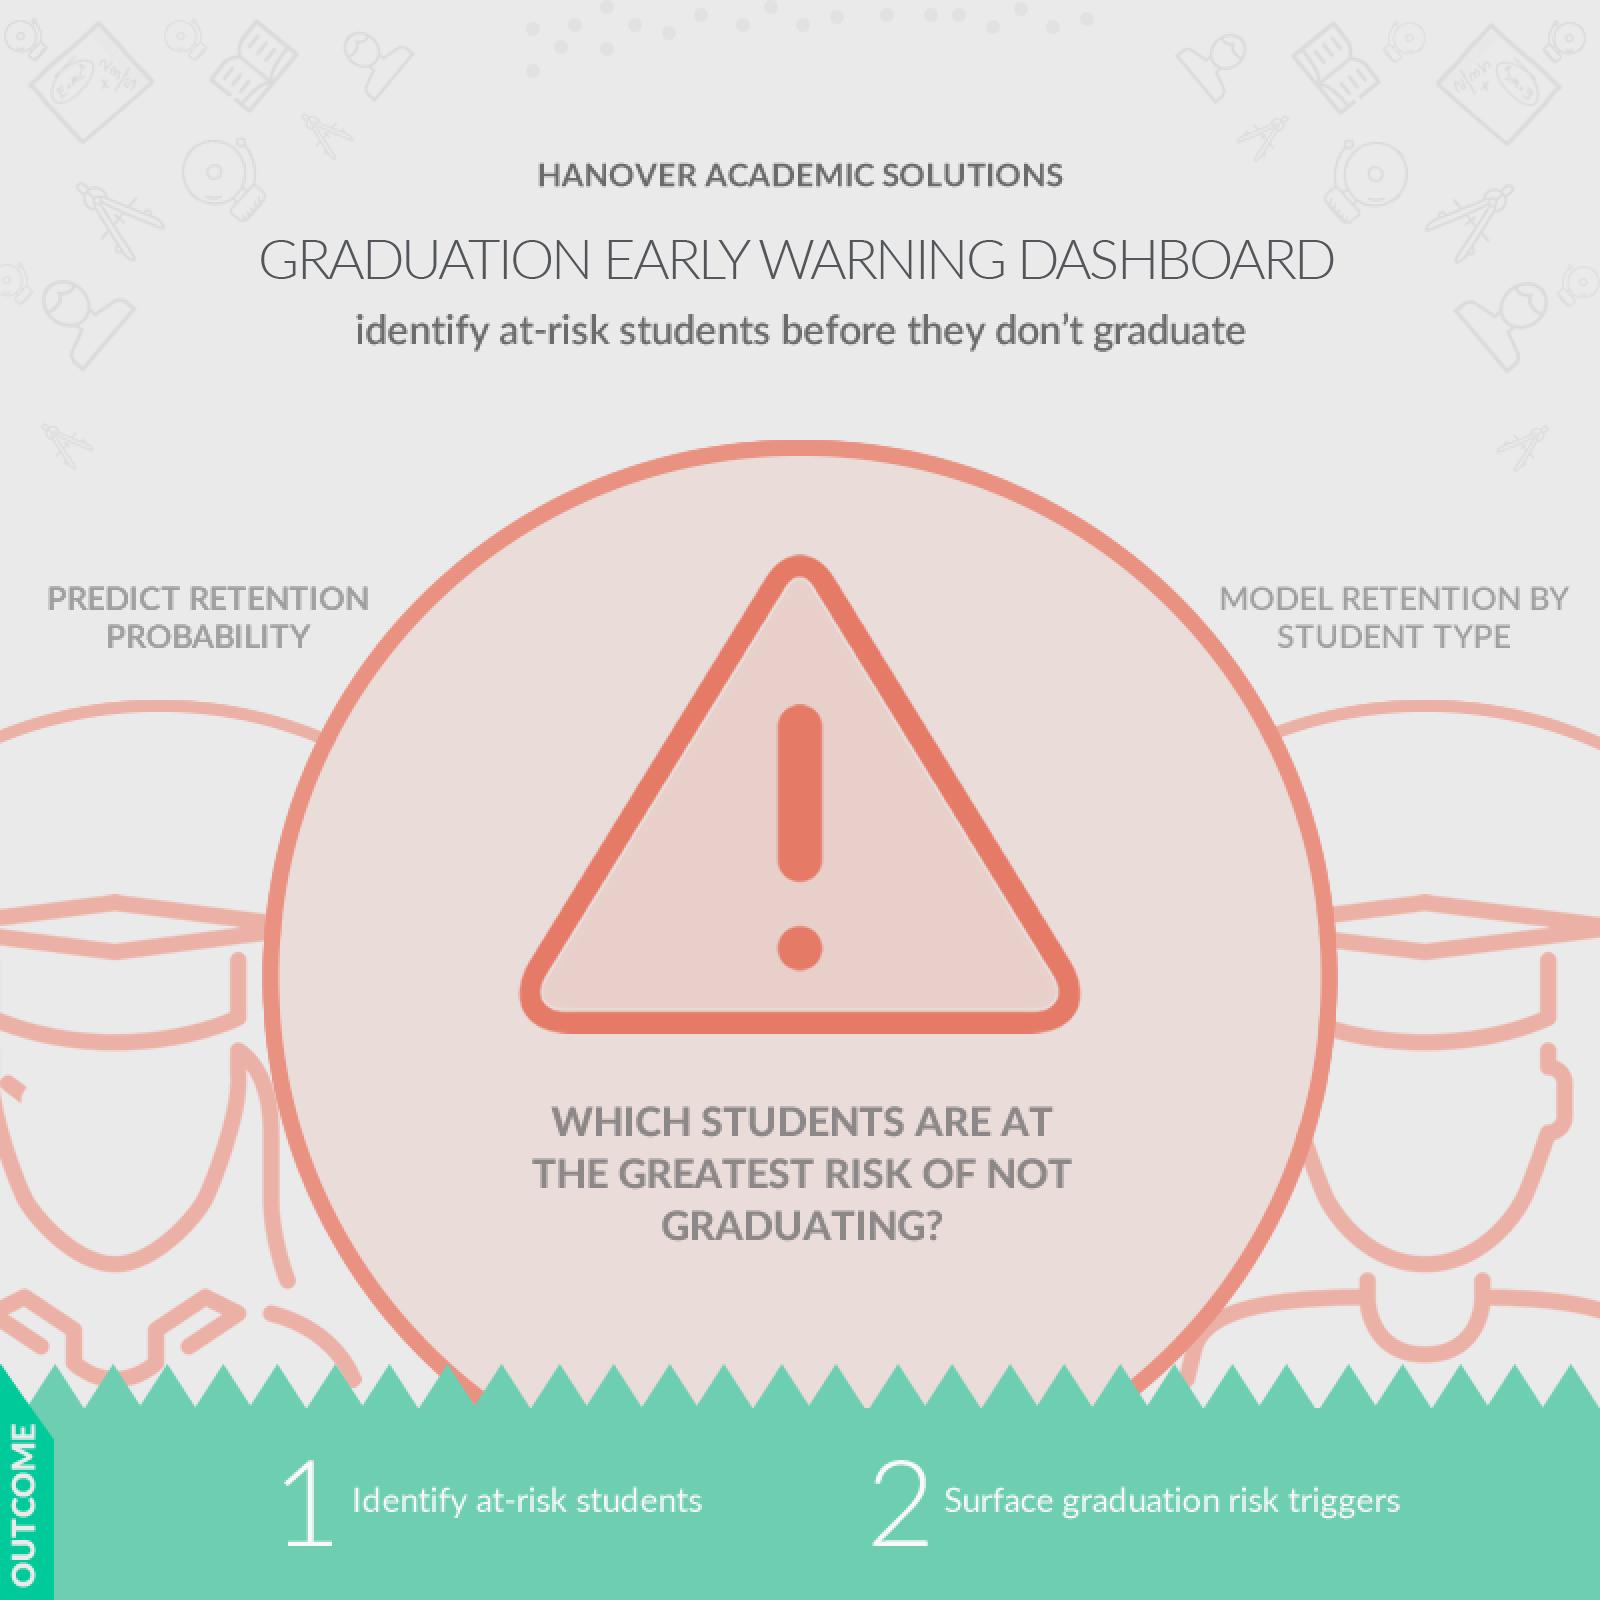 screenshot: graduation early warning dashboard